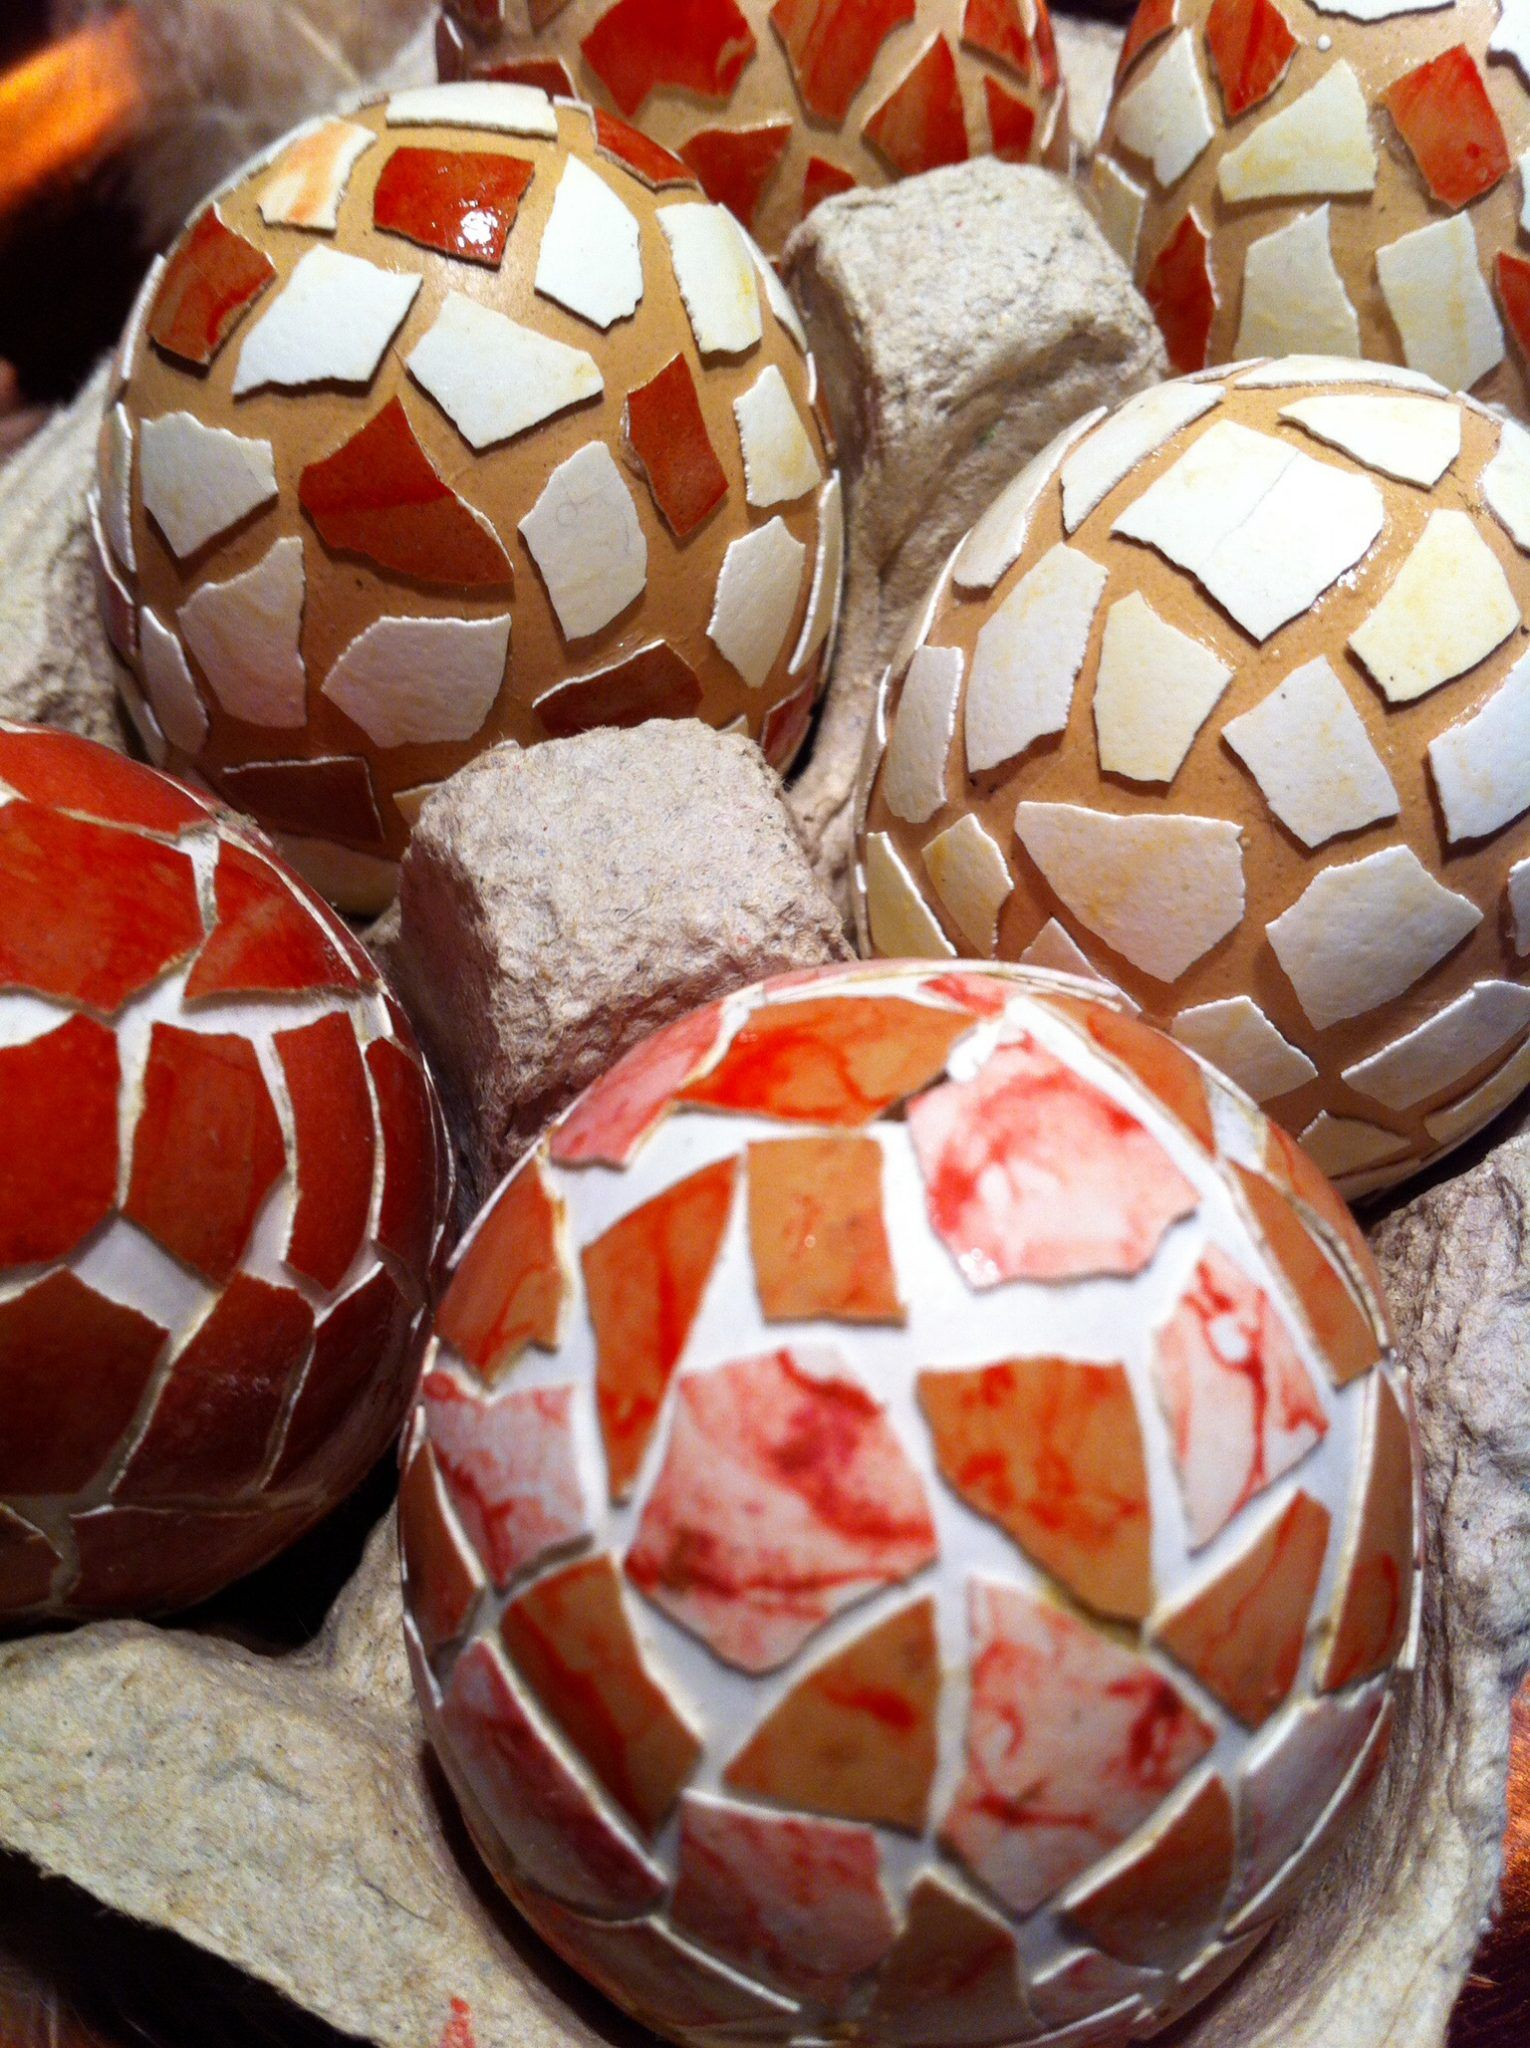 ostereier mit mosaik eier mit eierschalen bekleben anleitung diy anleitung stricken h keln. Black Bedroom Furniture Sets. Home Design Ideas